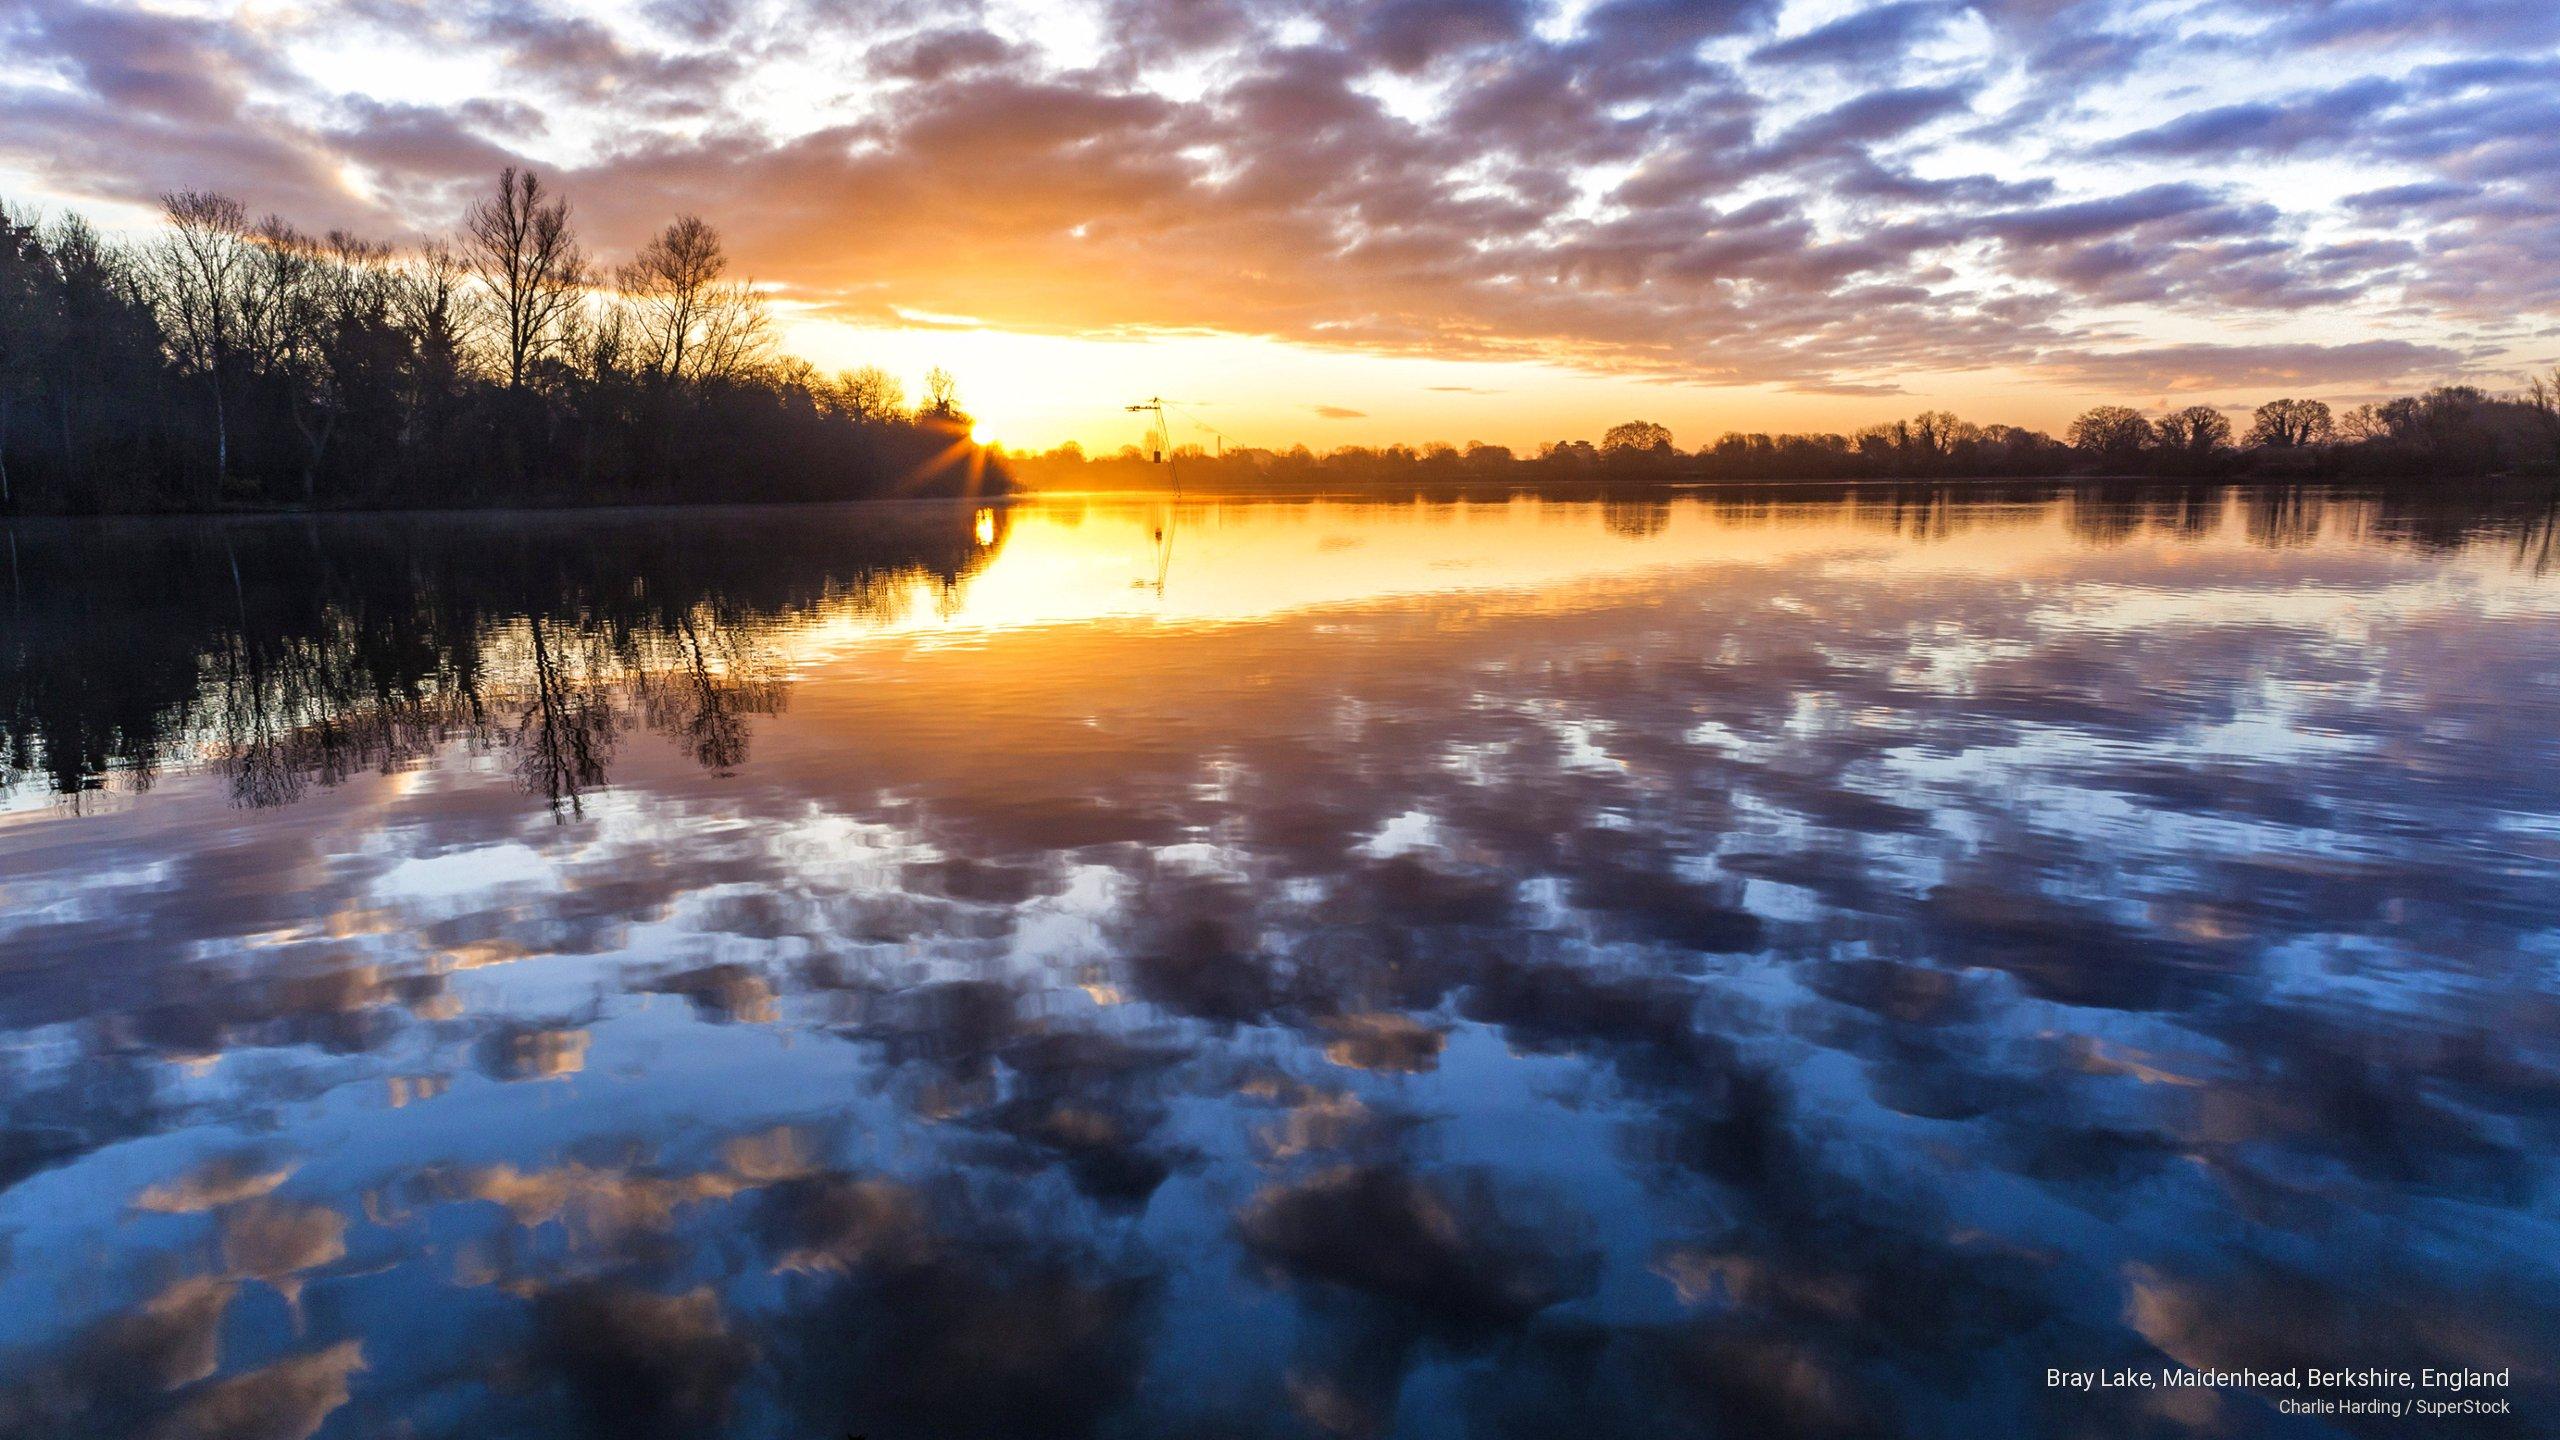 Bray Lake, Maidenhead, Berkshire, England